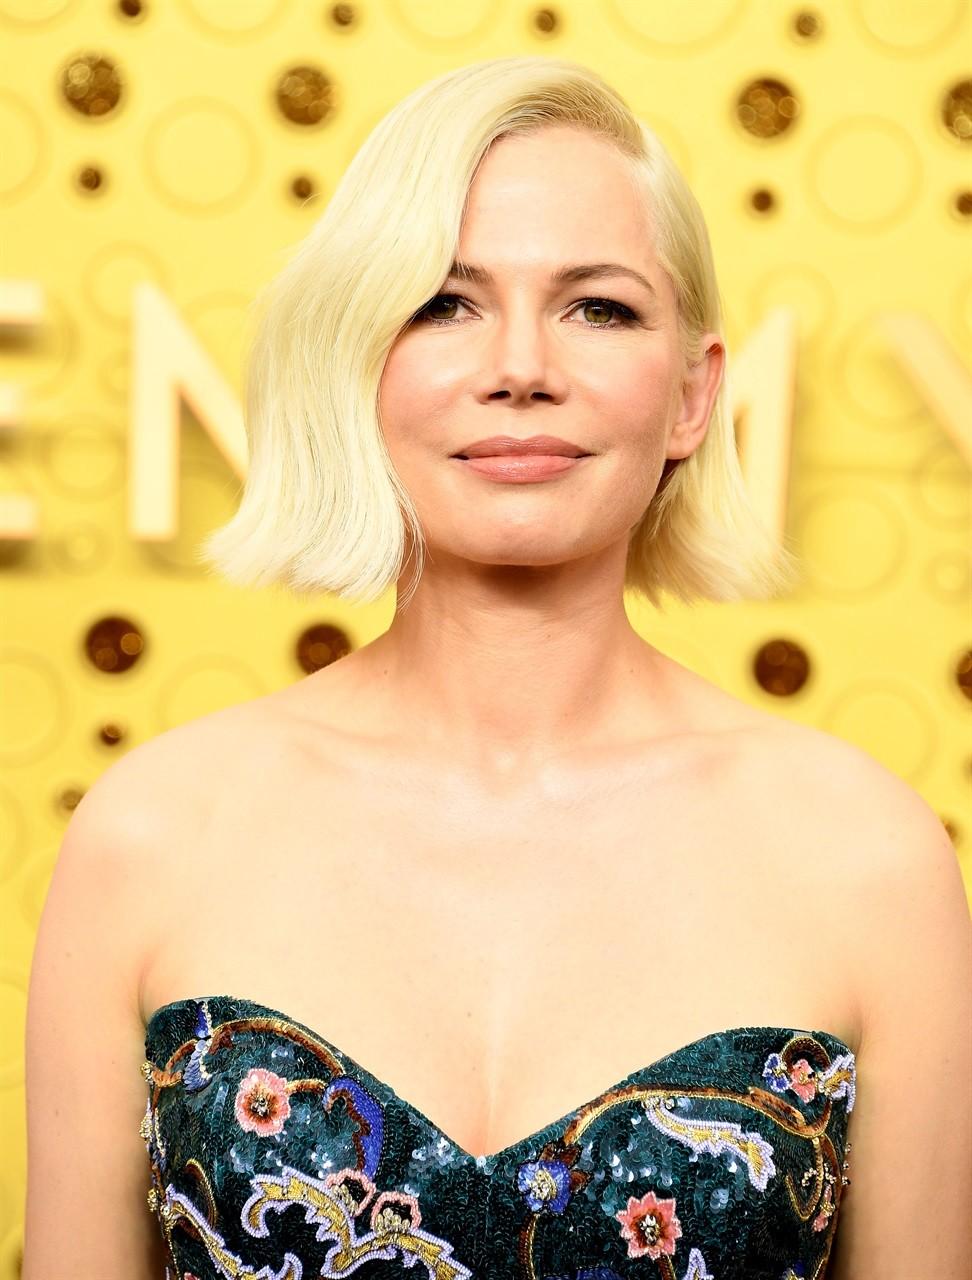 awards, fashion, and celebrities image